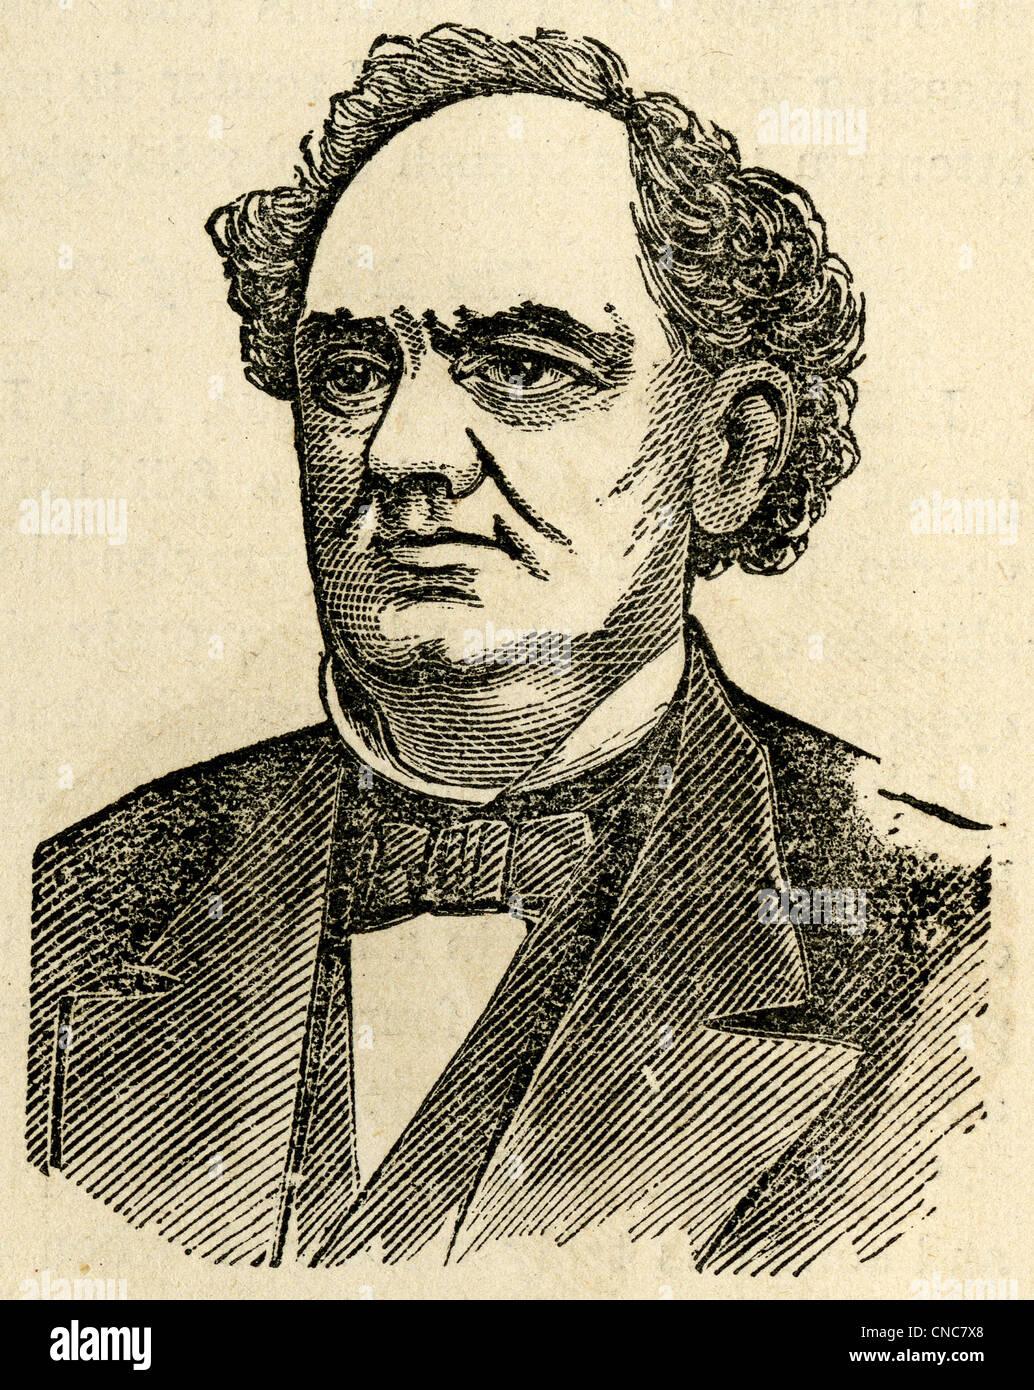 Simples 1871 xilogravura gravura de PT Barnum. Imagens de Stock